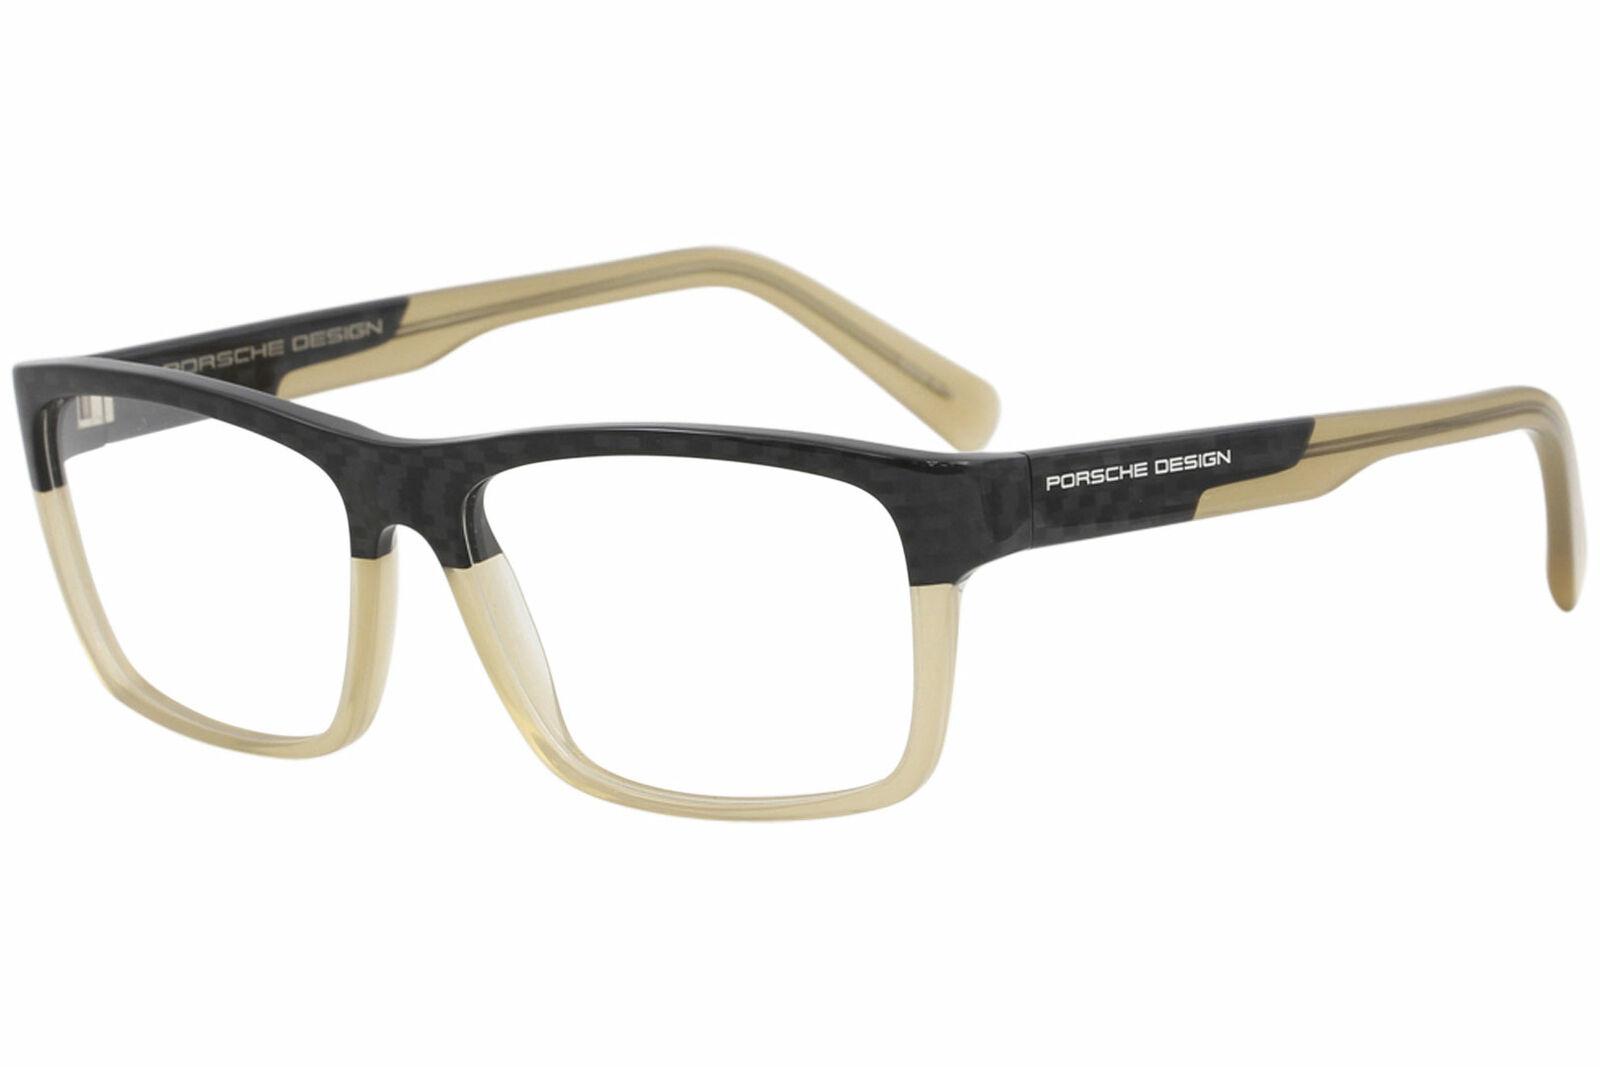 NEW Porsche Design P8286 D 56mm Satin Palladium Grey Optical Eyeglasses Frames